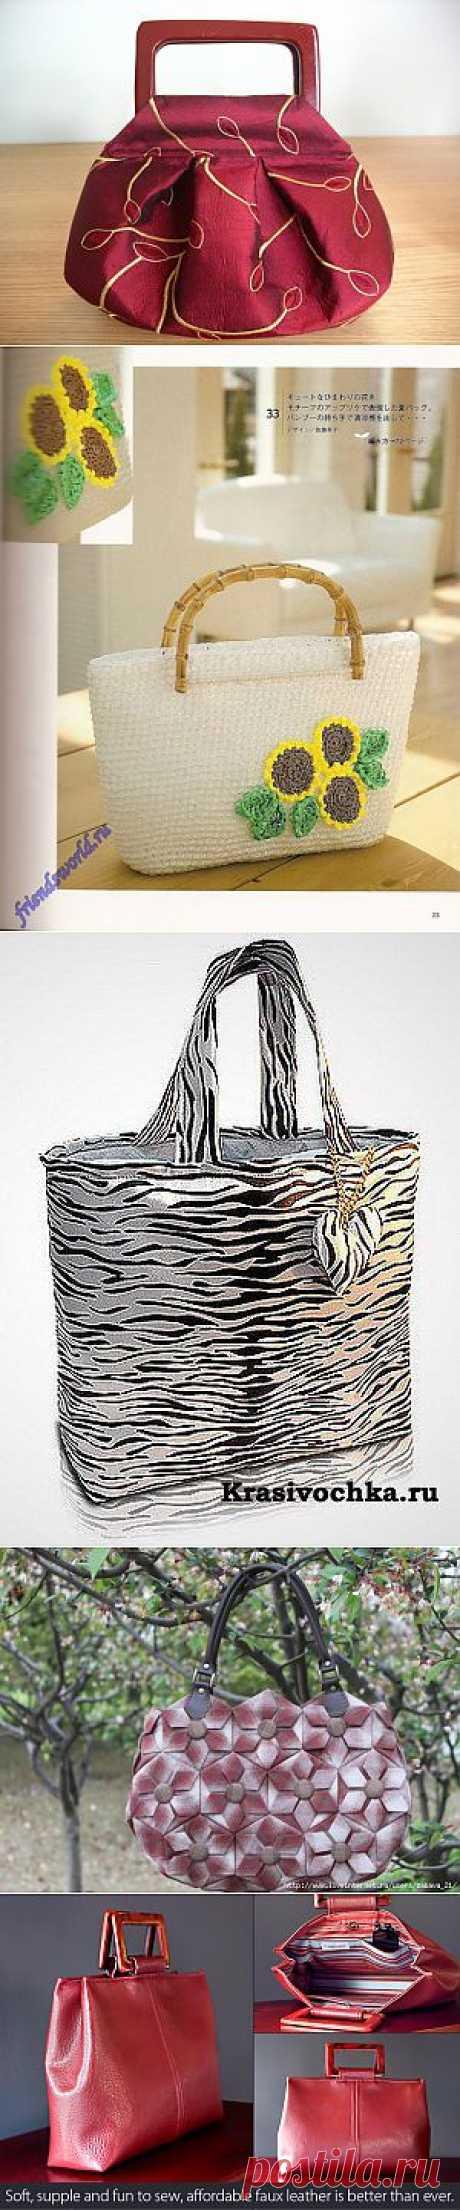 сумки , чемоданы , косметички | Записи в рубрике сумки , чемоданы , косметички | Сокровища Амазонки